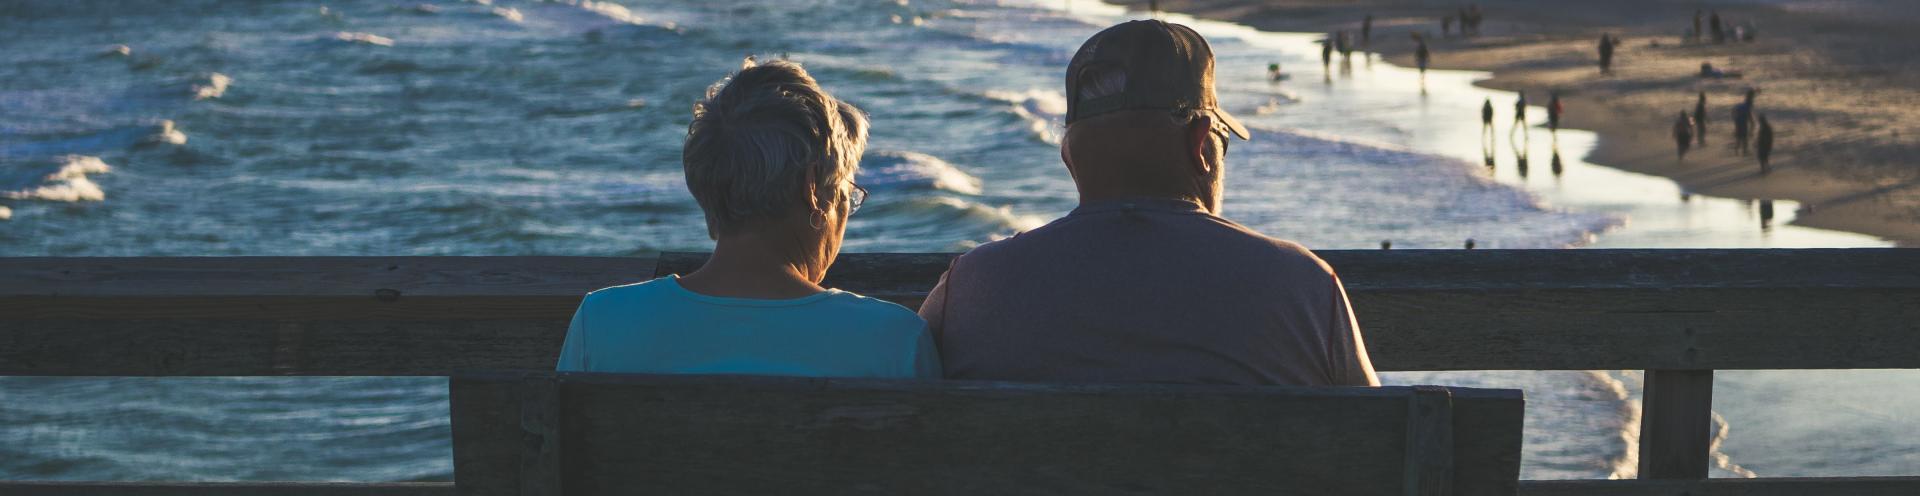 duurzaam pensioen